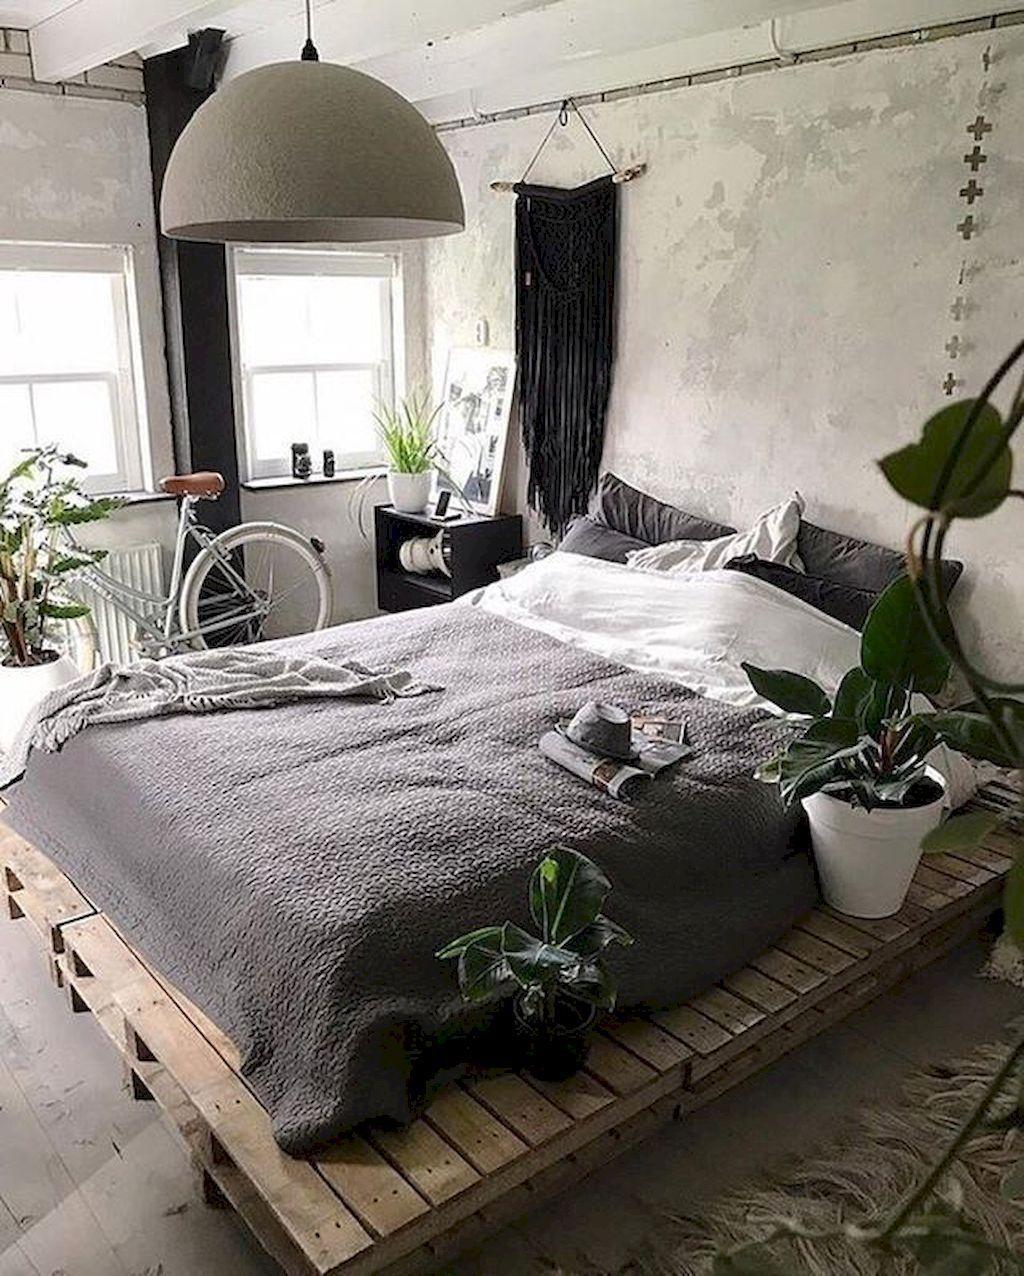 30 Modern Style For Industrial Bedroom Design Ideas Apartment Bedroom Decor Industrial Bedroom Design Bedroom Vintage Vintage minimalist bedroom design